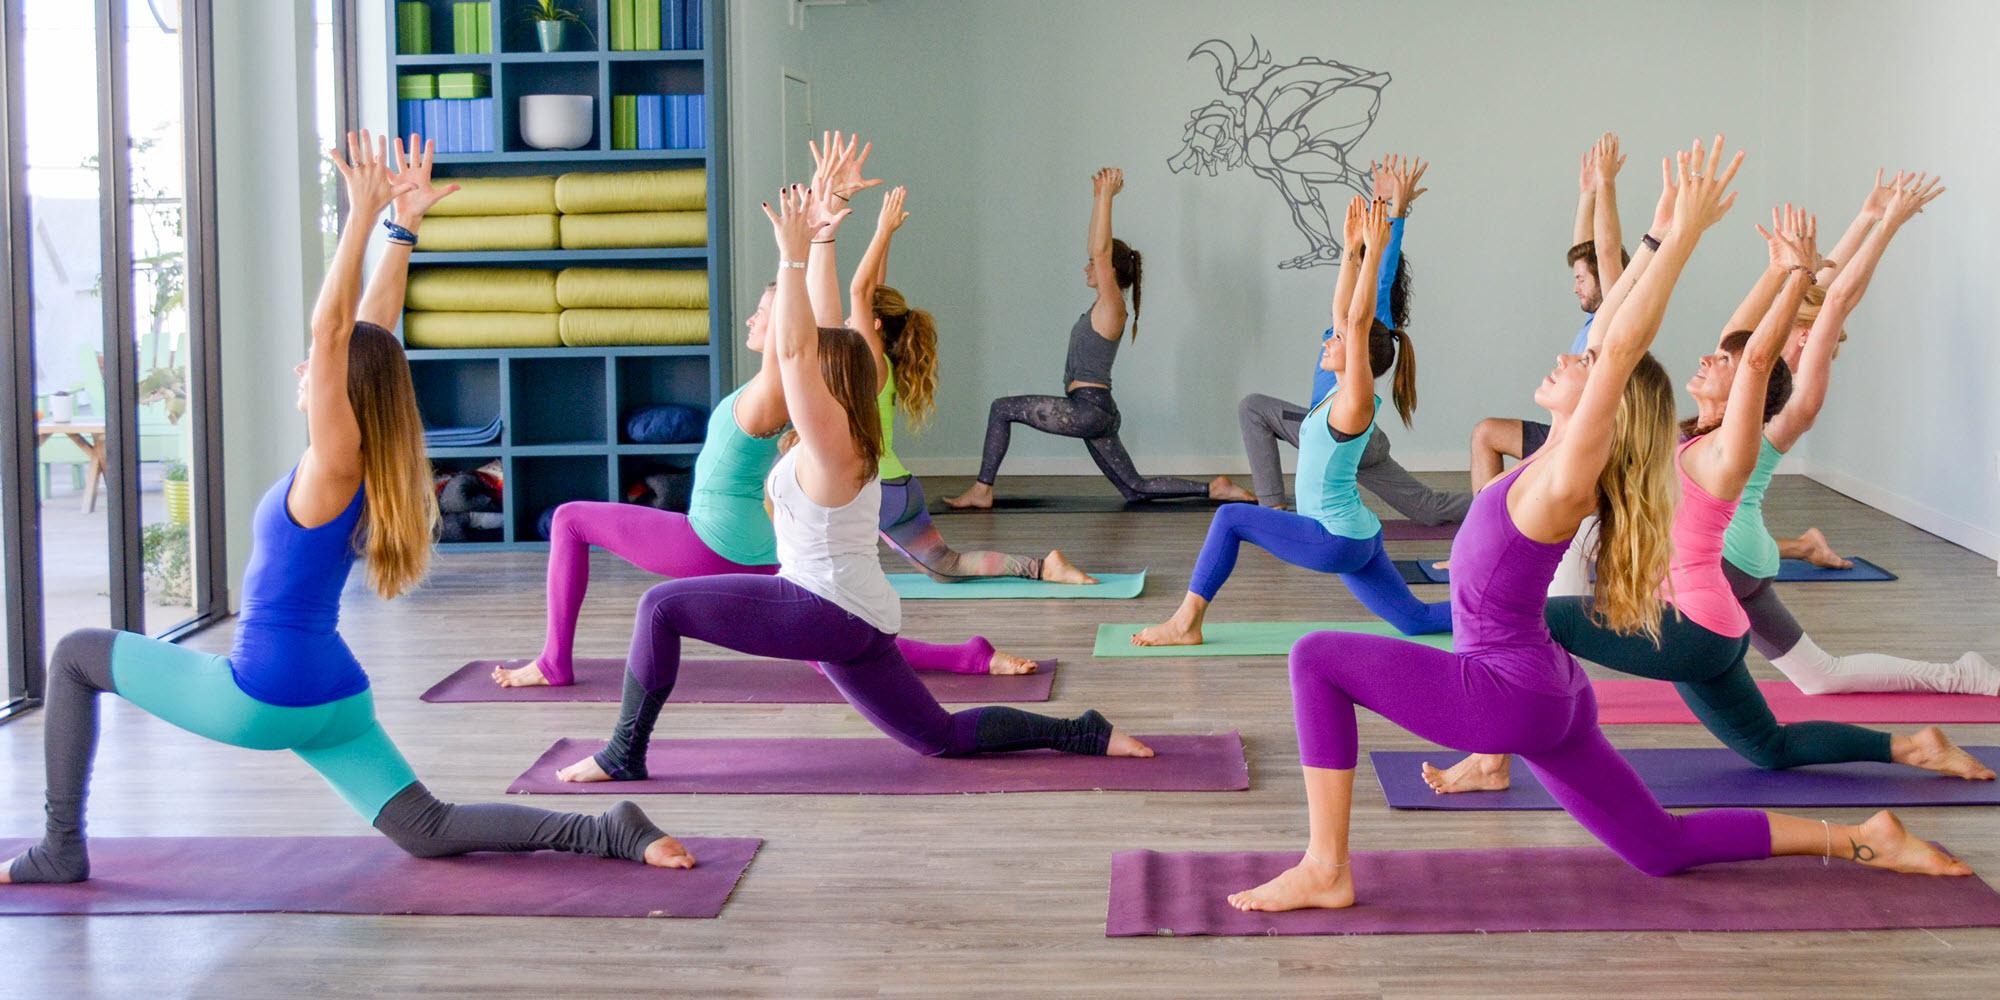 Thảm tập yoga tốt nhất